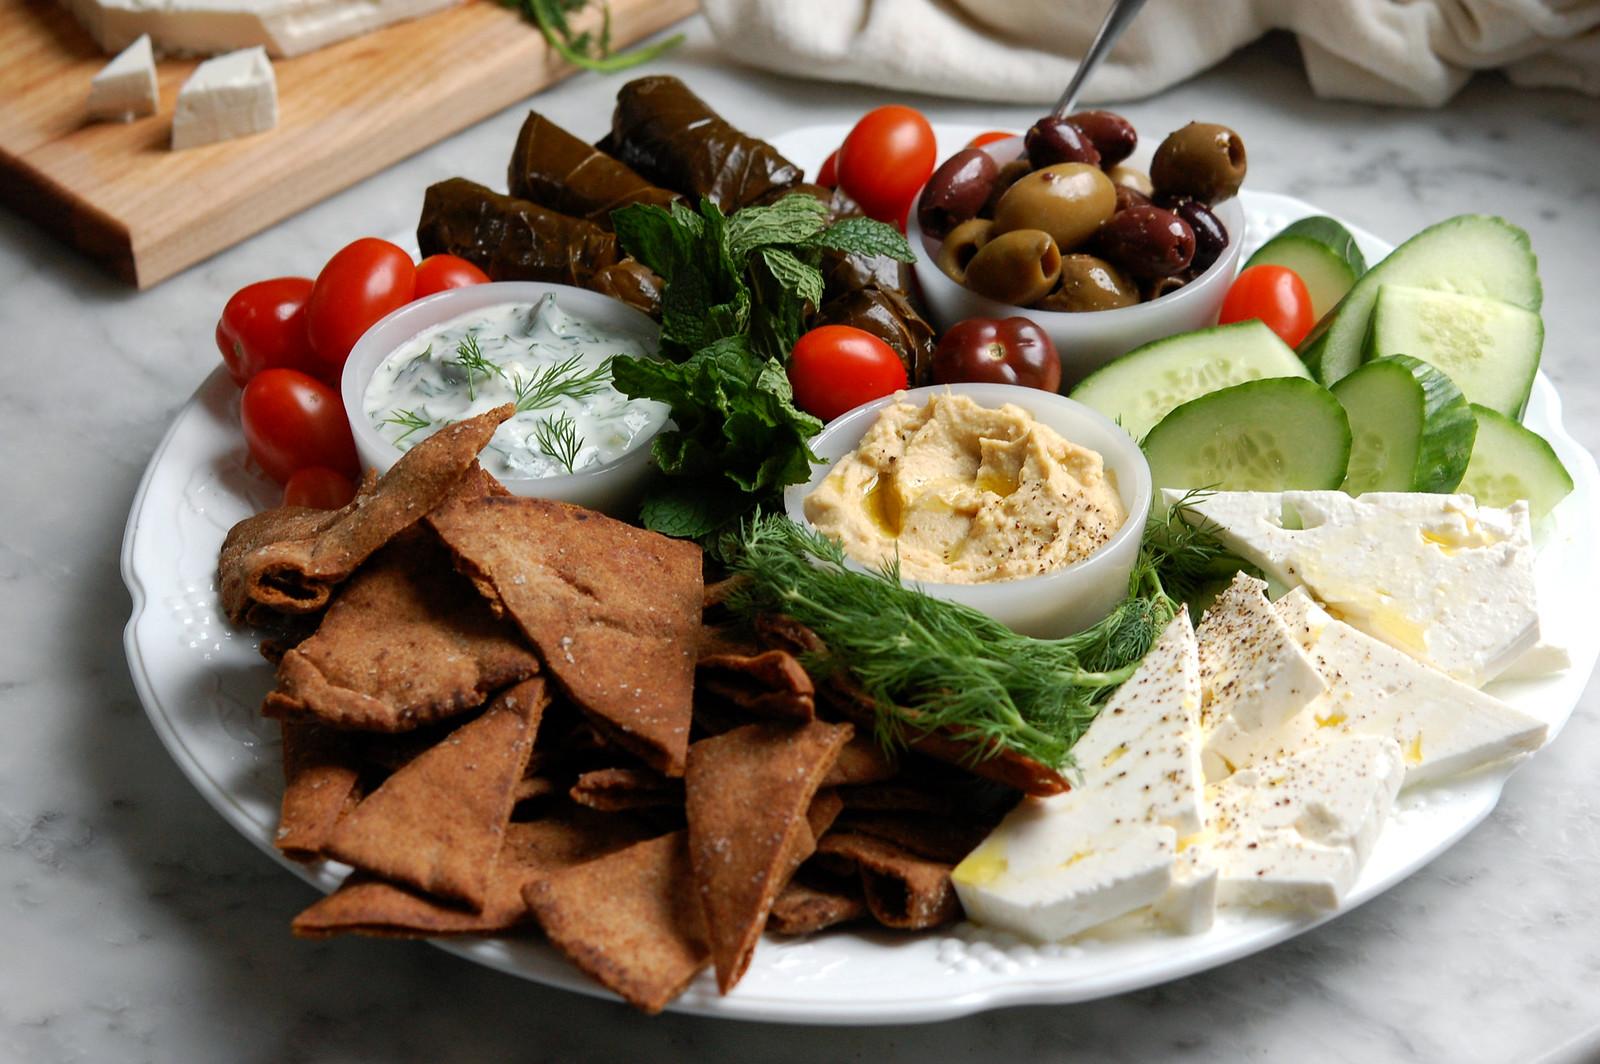 mezze platter with hummus tzatziki pita olives and feta